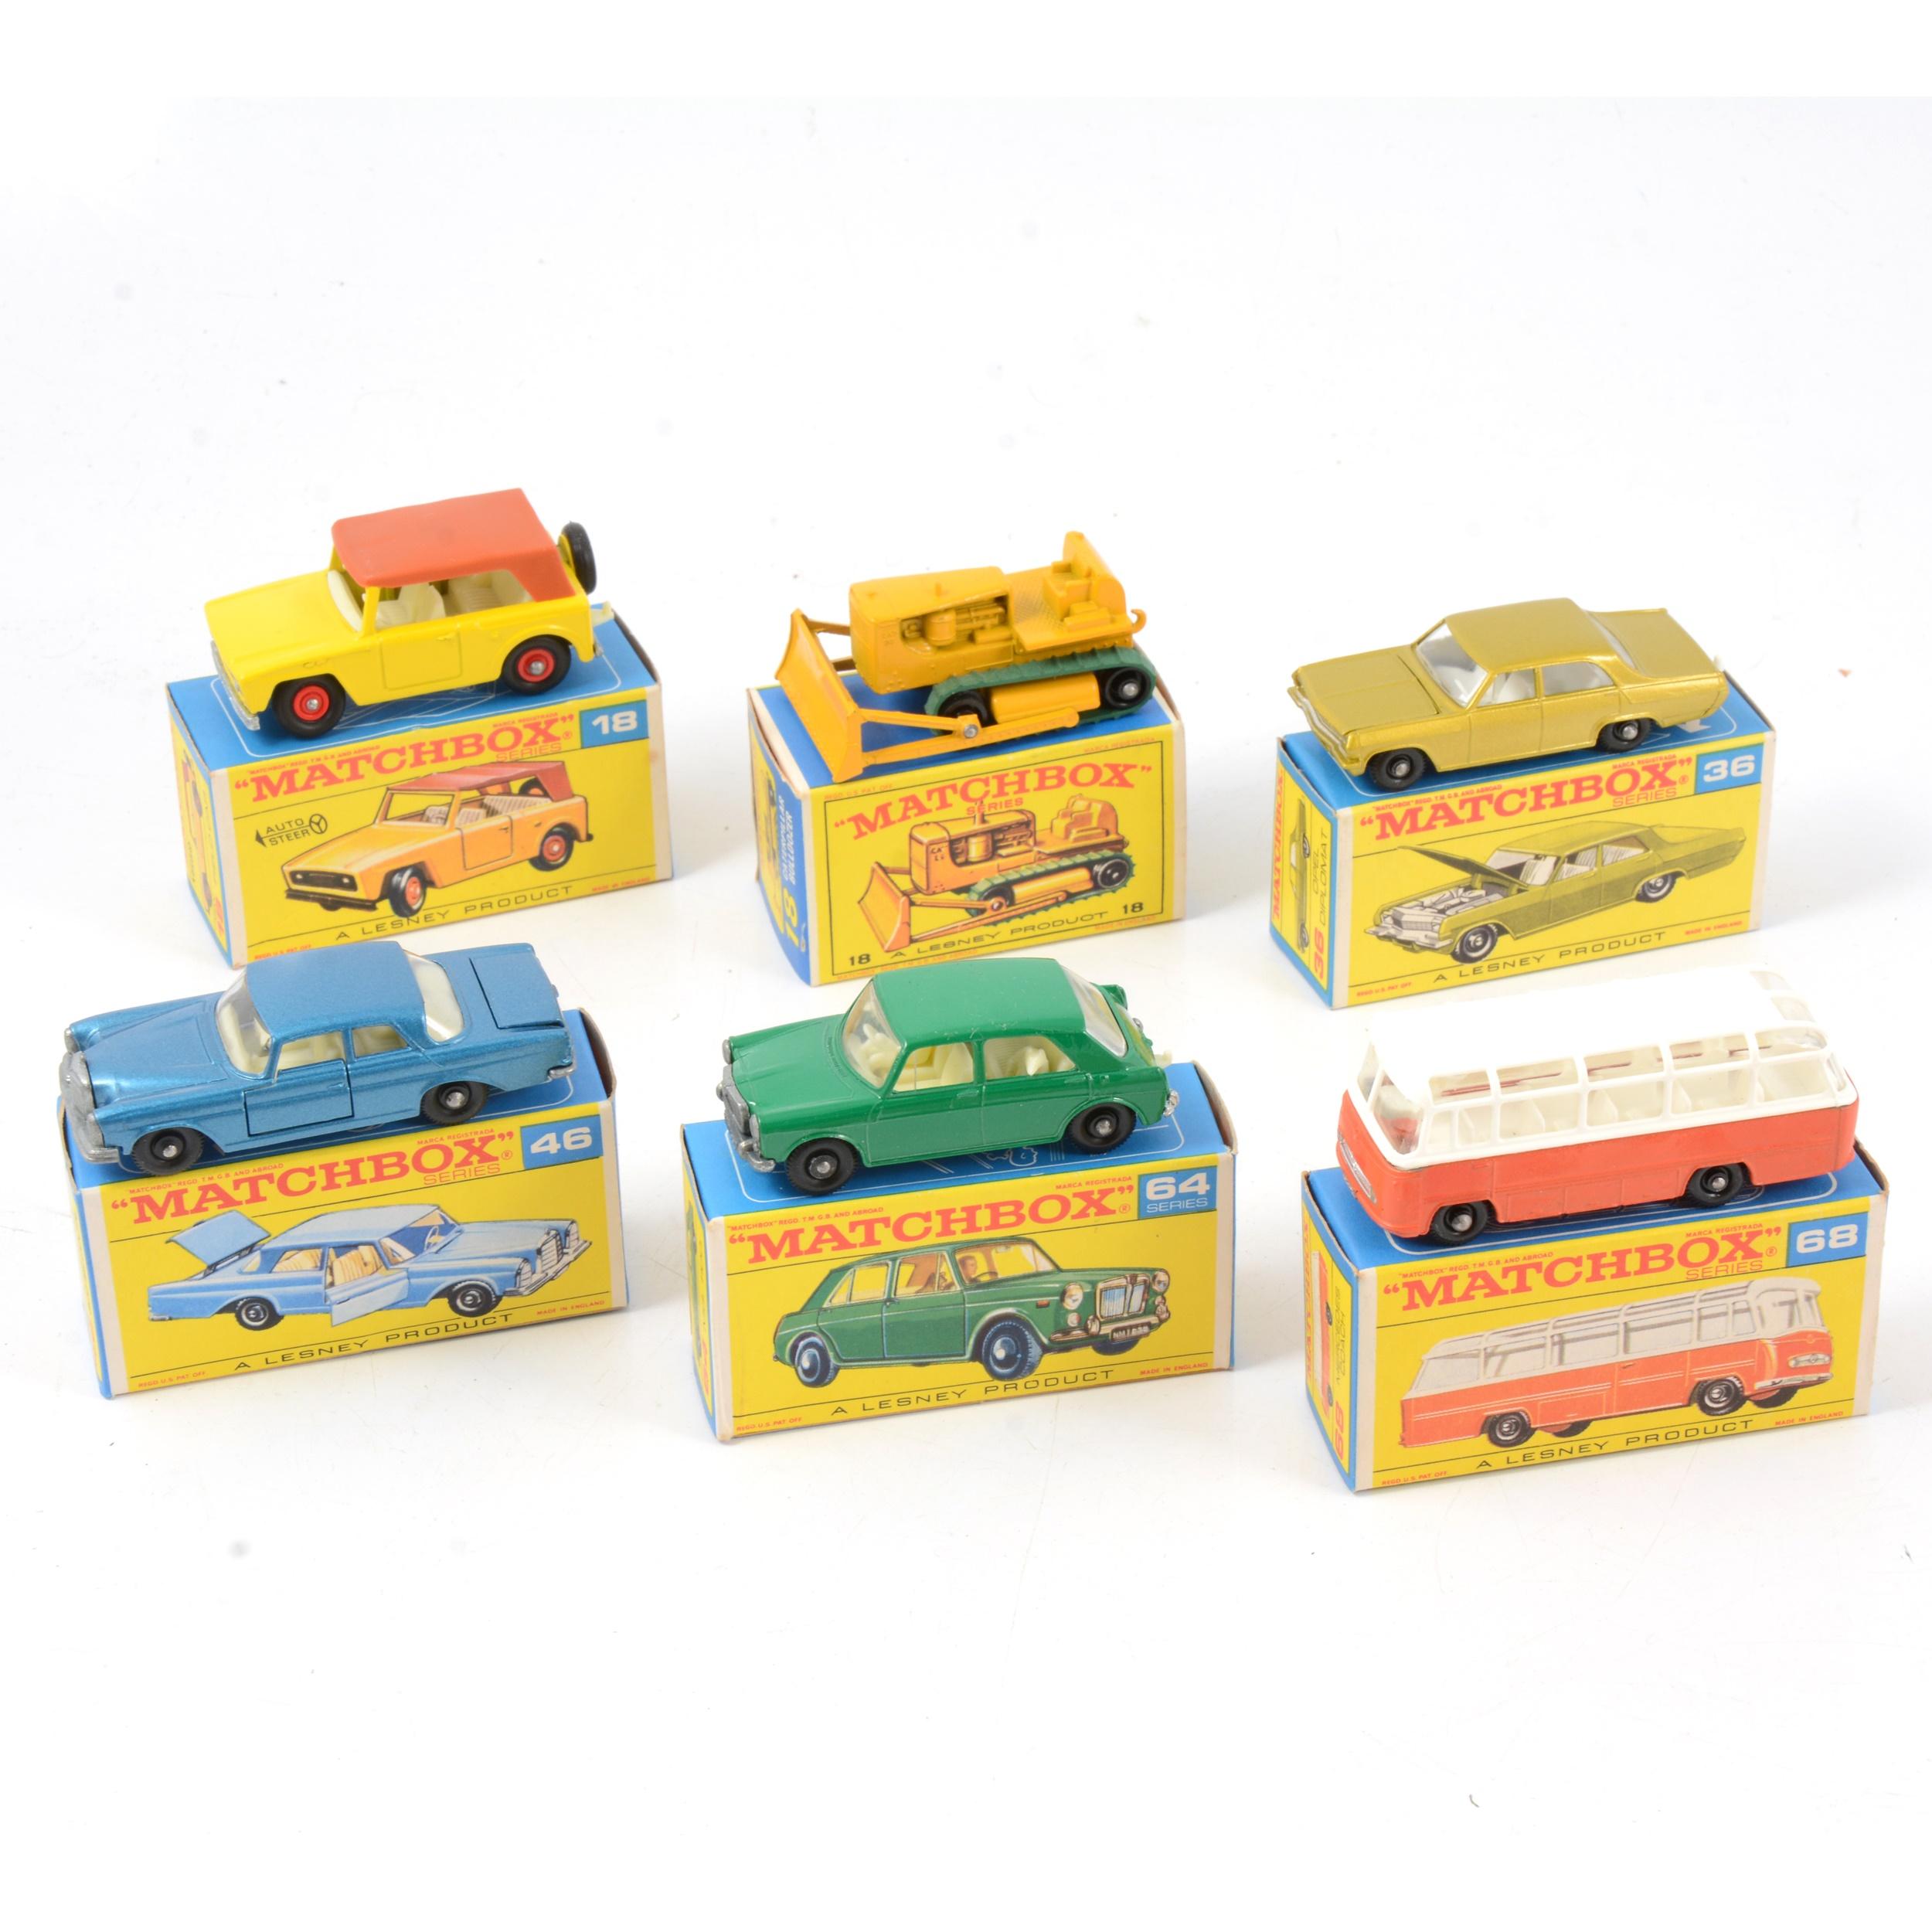 Matchbox Lesney die-cast models; six including 18 field car.